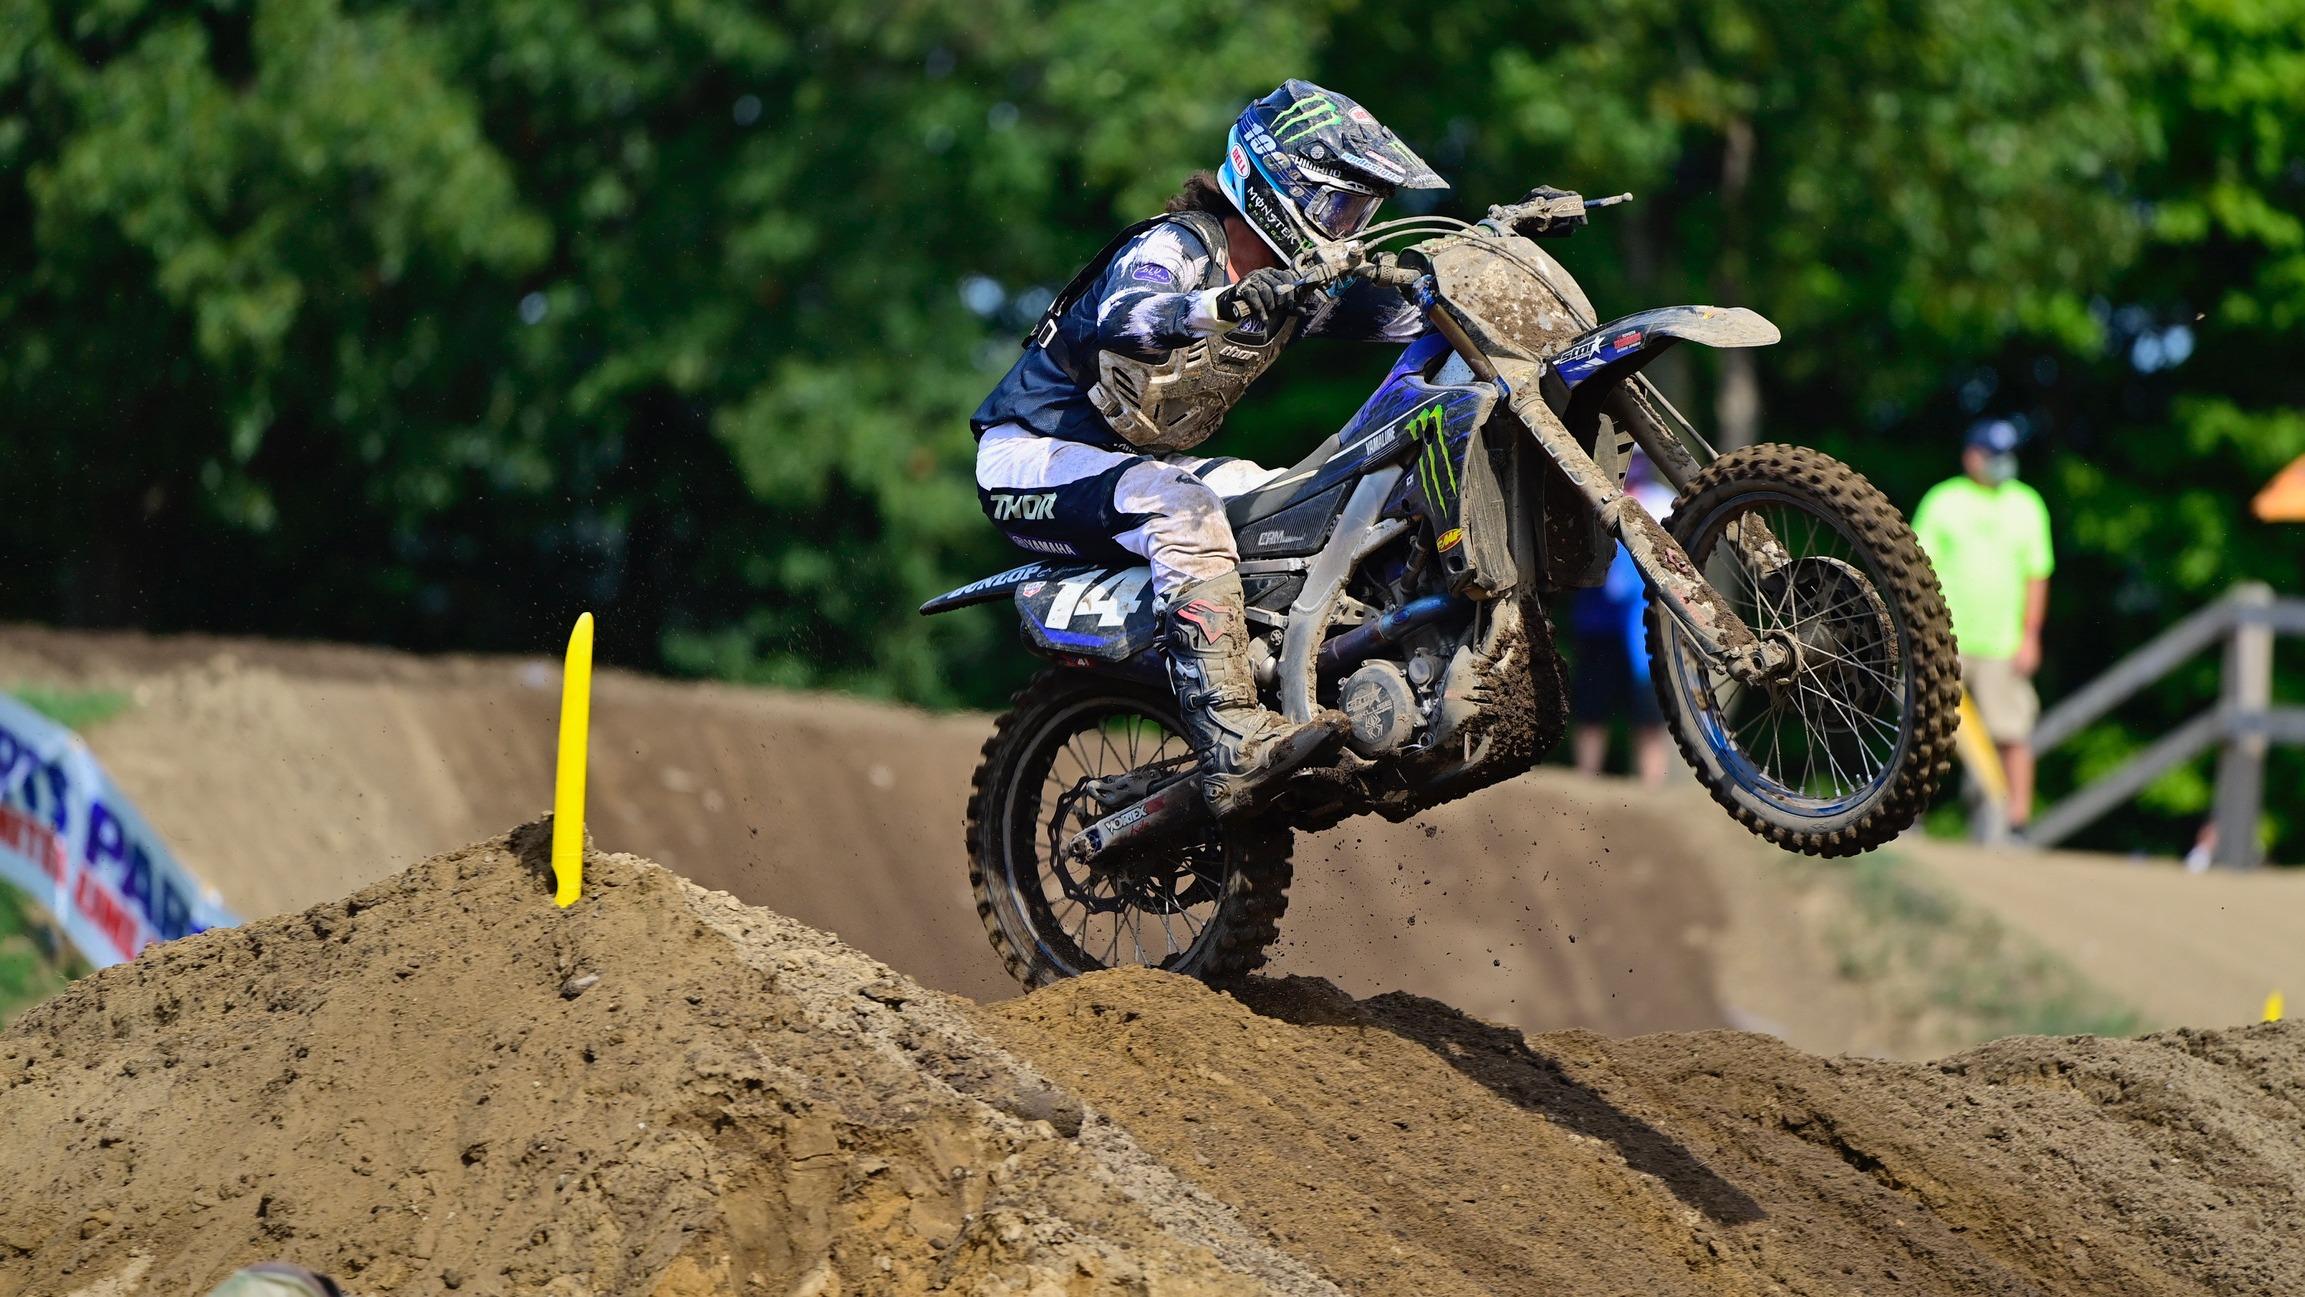 Race Report: Star Yamaha at RedBud II